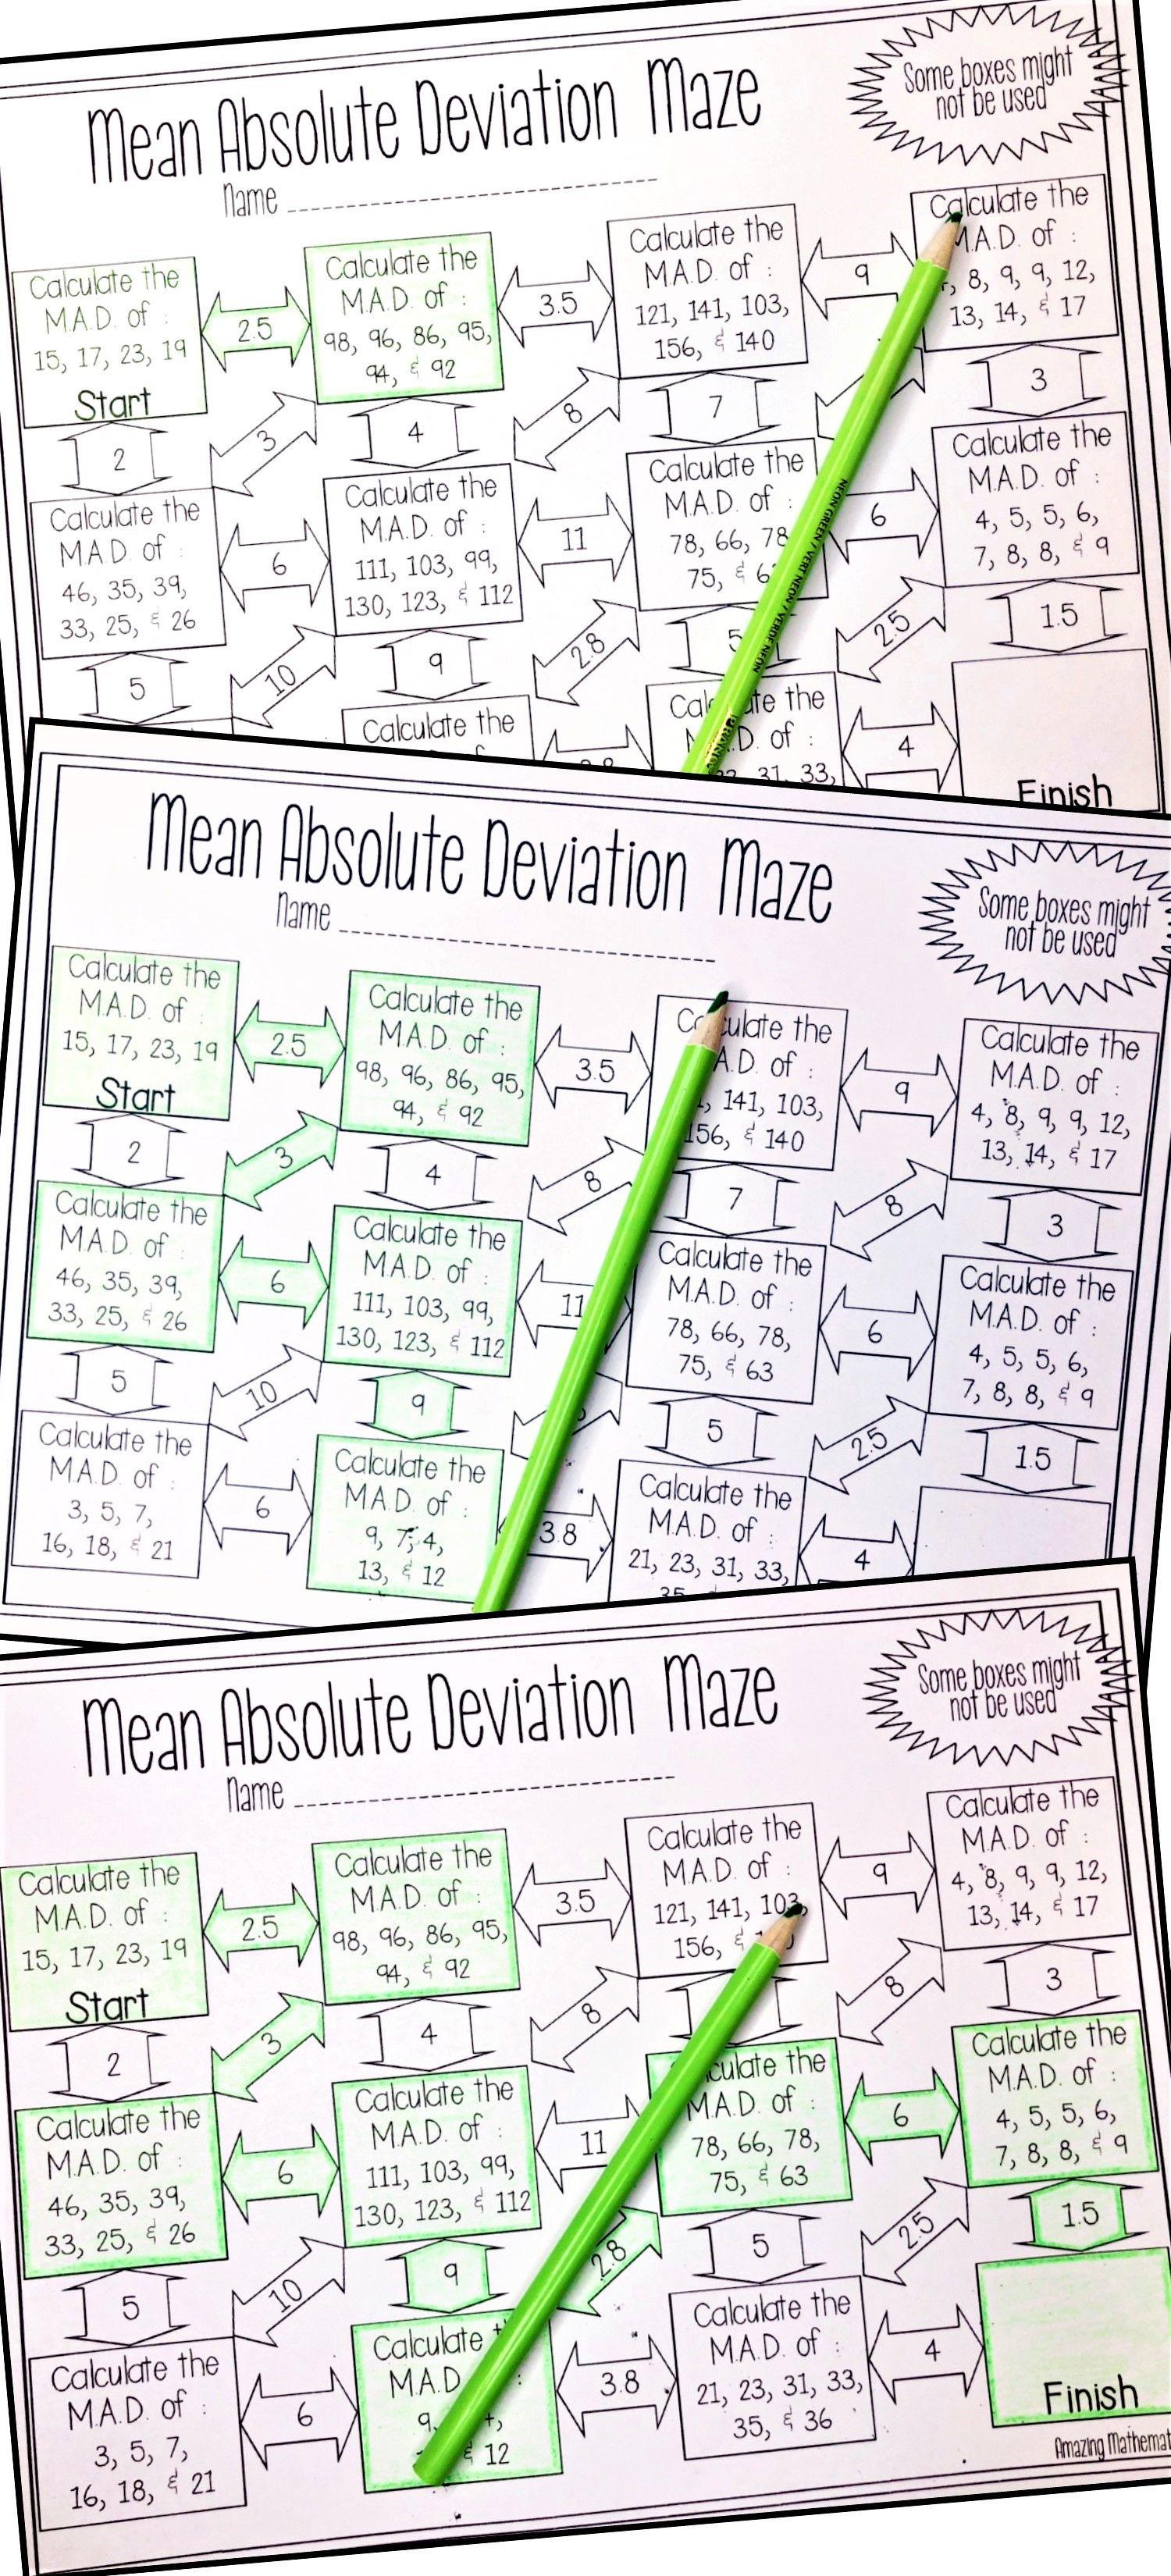 Mean Absolute Deviation Worksheet - Maze Activity   8th grade math  worksheets [ 3300 x 1500 Pixel ]